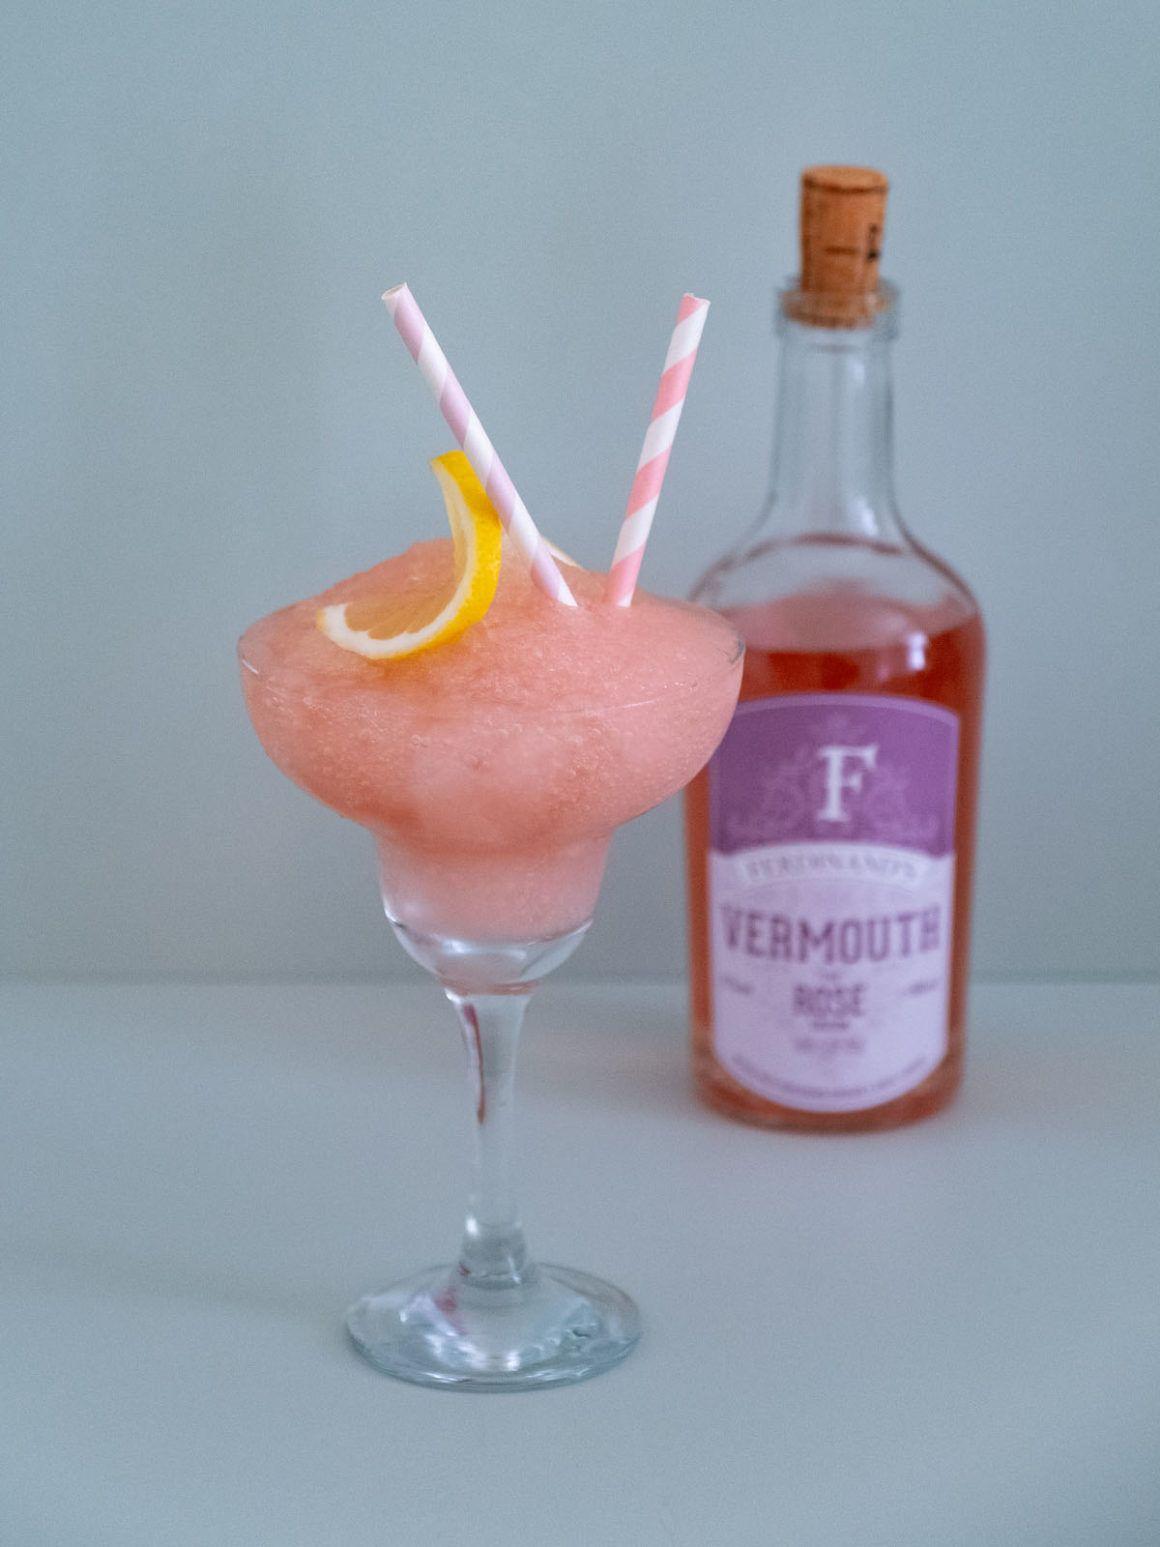 About Fuel, Foodblog, Rezept, Drink, Vermouth, Frozen Margarita